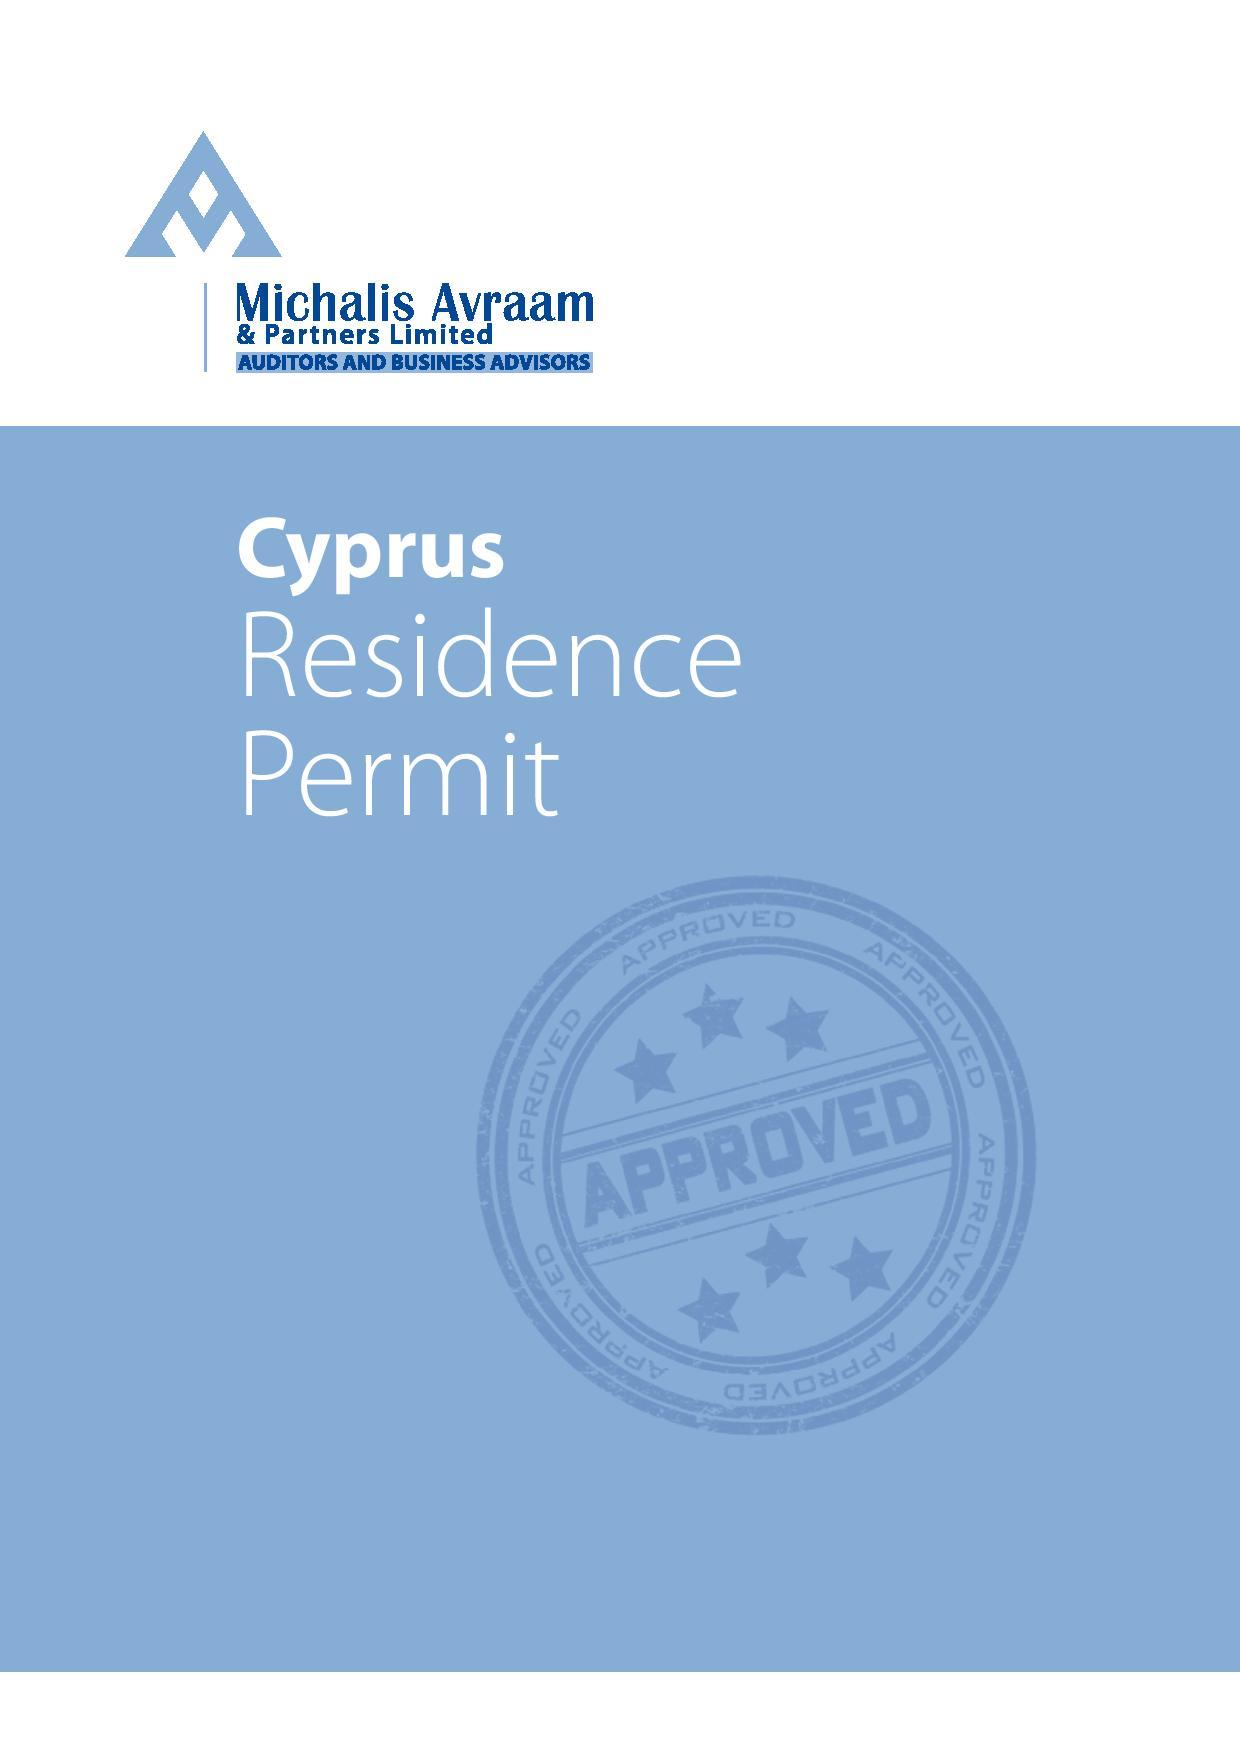 Cyprus Residence Permit